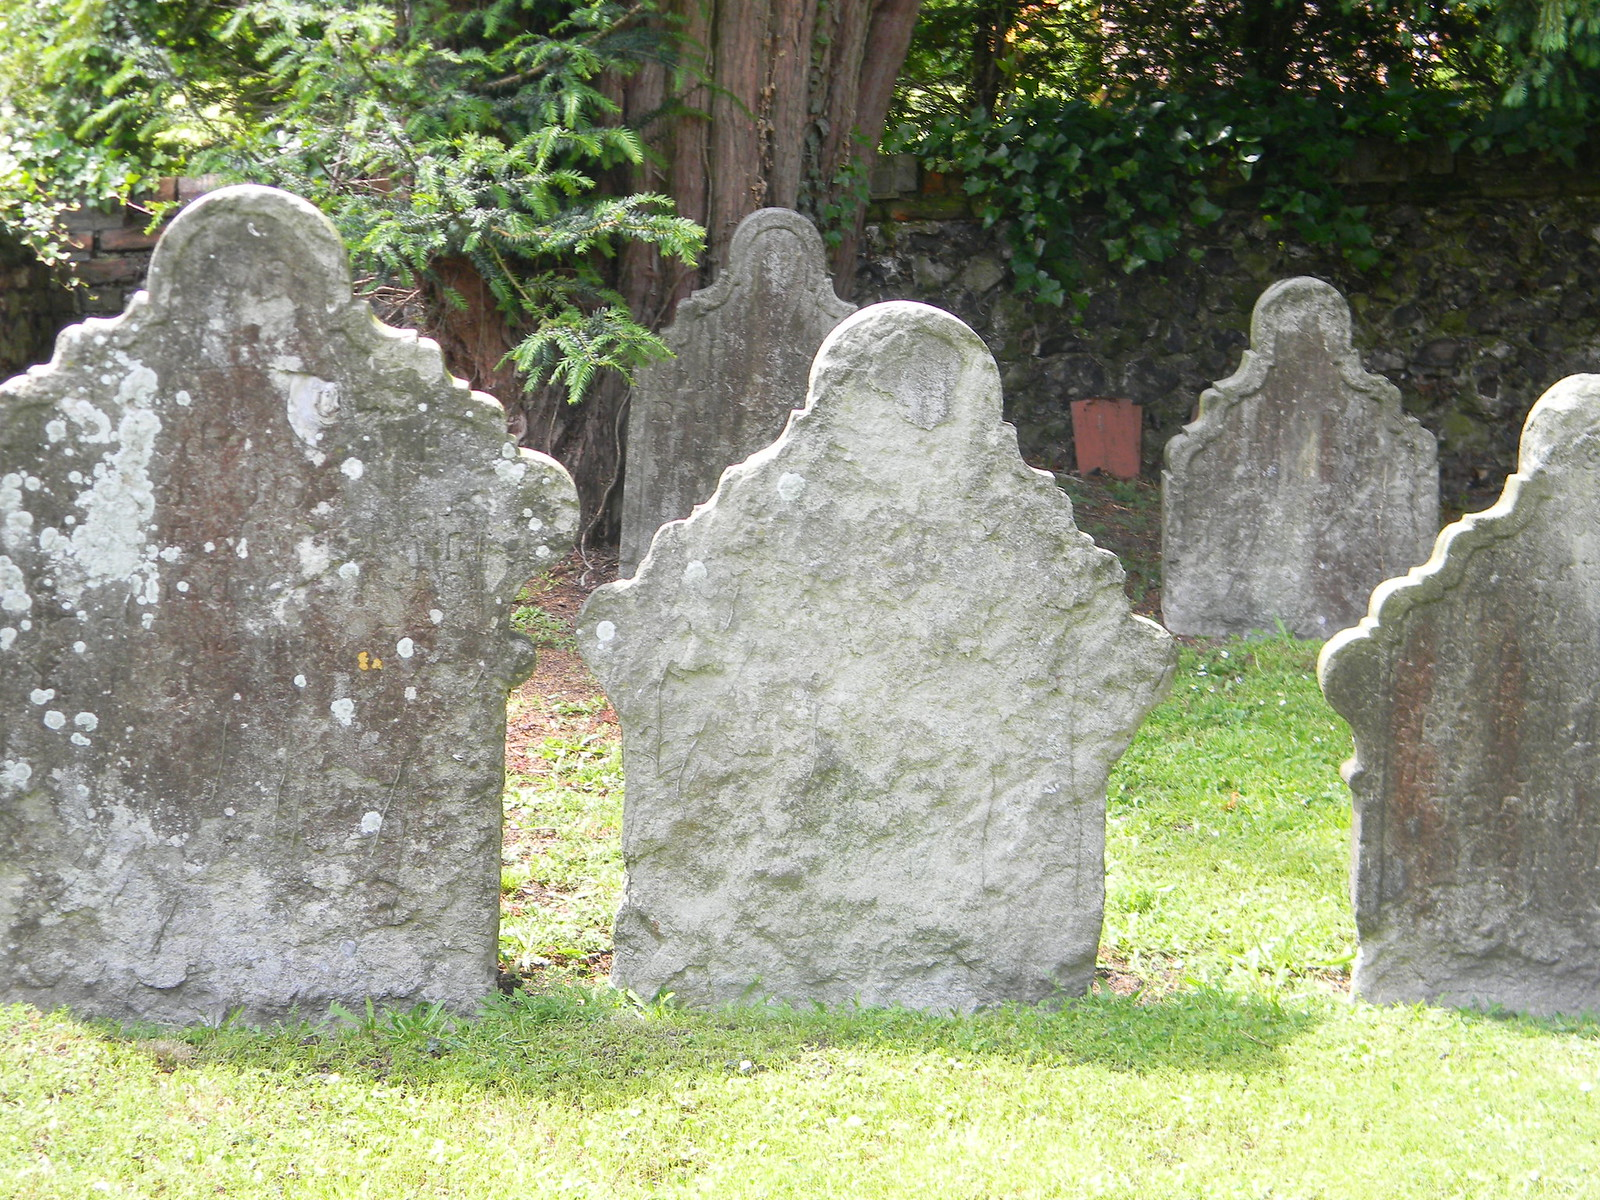 Graveyard 'spooks' Humanoid gravestones. Luddesdown. Cuxton to Sole Street